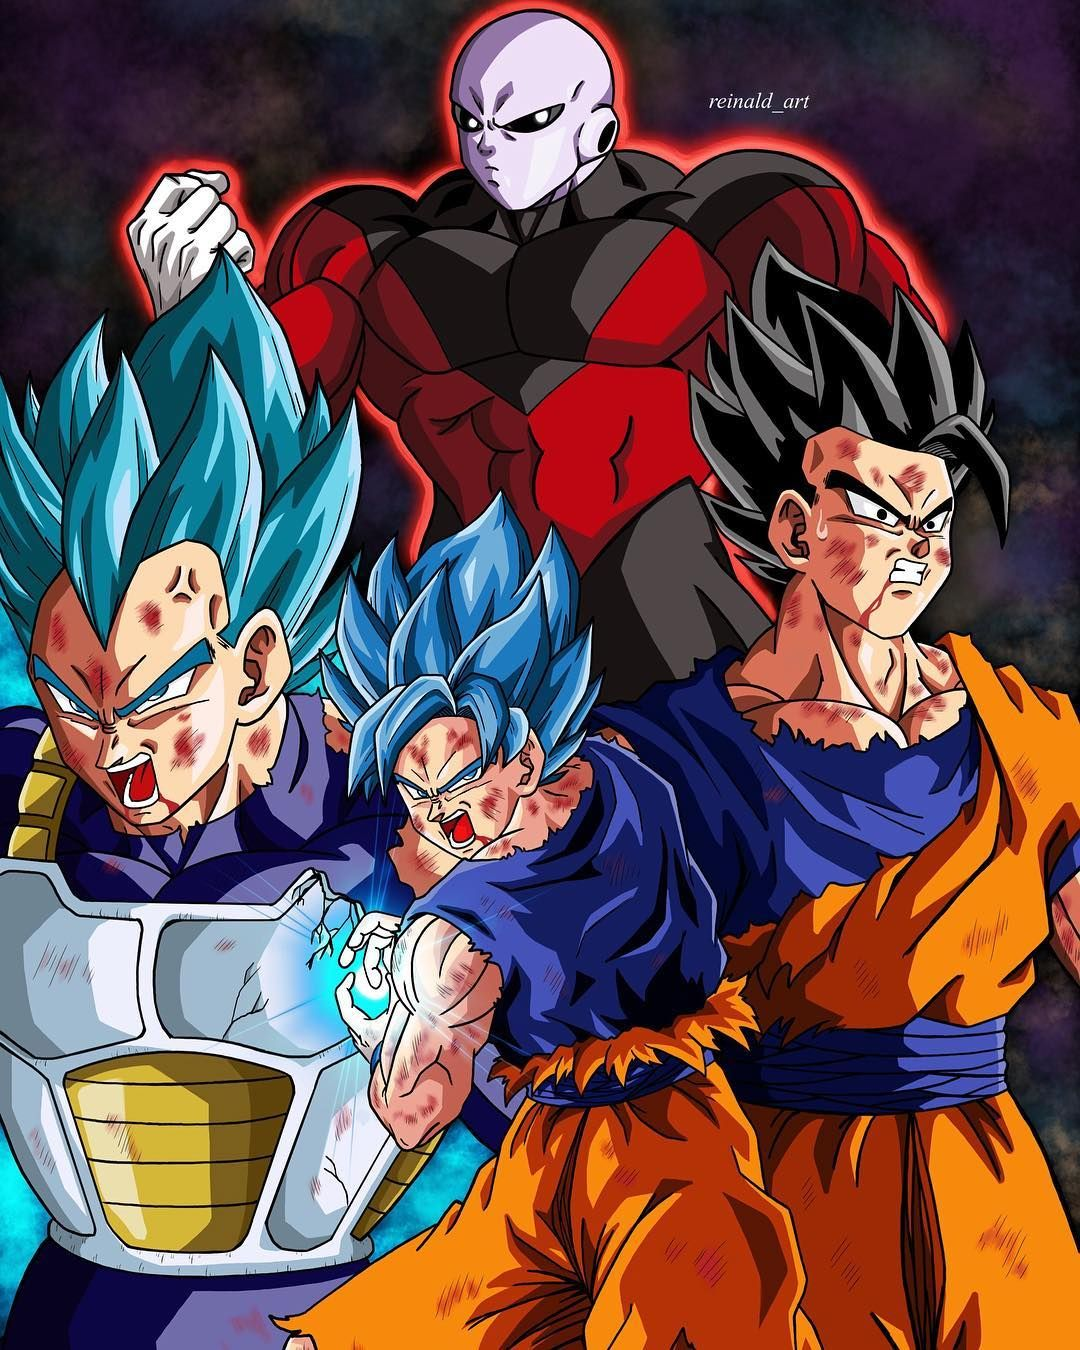 Goku, Vegeta, and Gohan vs Jiren the Grey | dragon ball ...